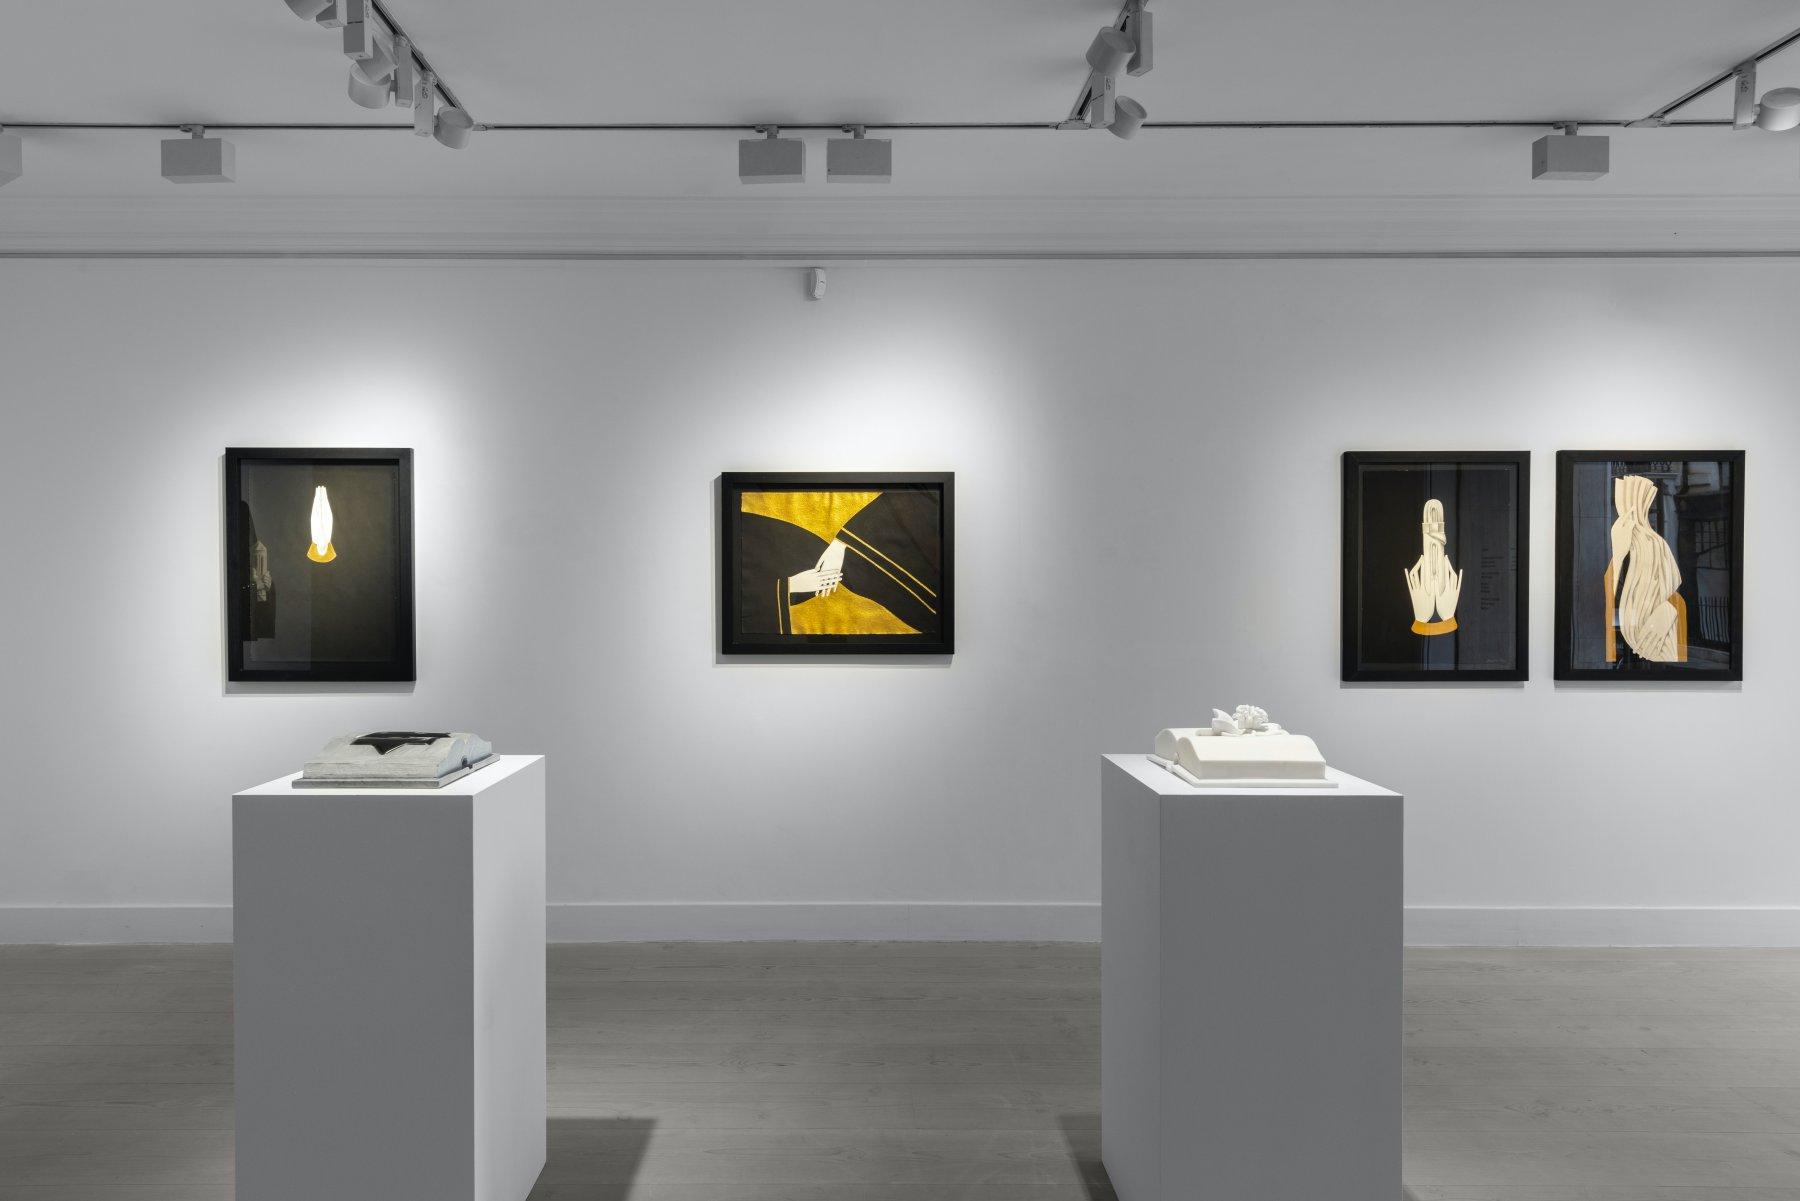 Gazelli Art House Aidan Salakhova 1